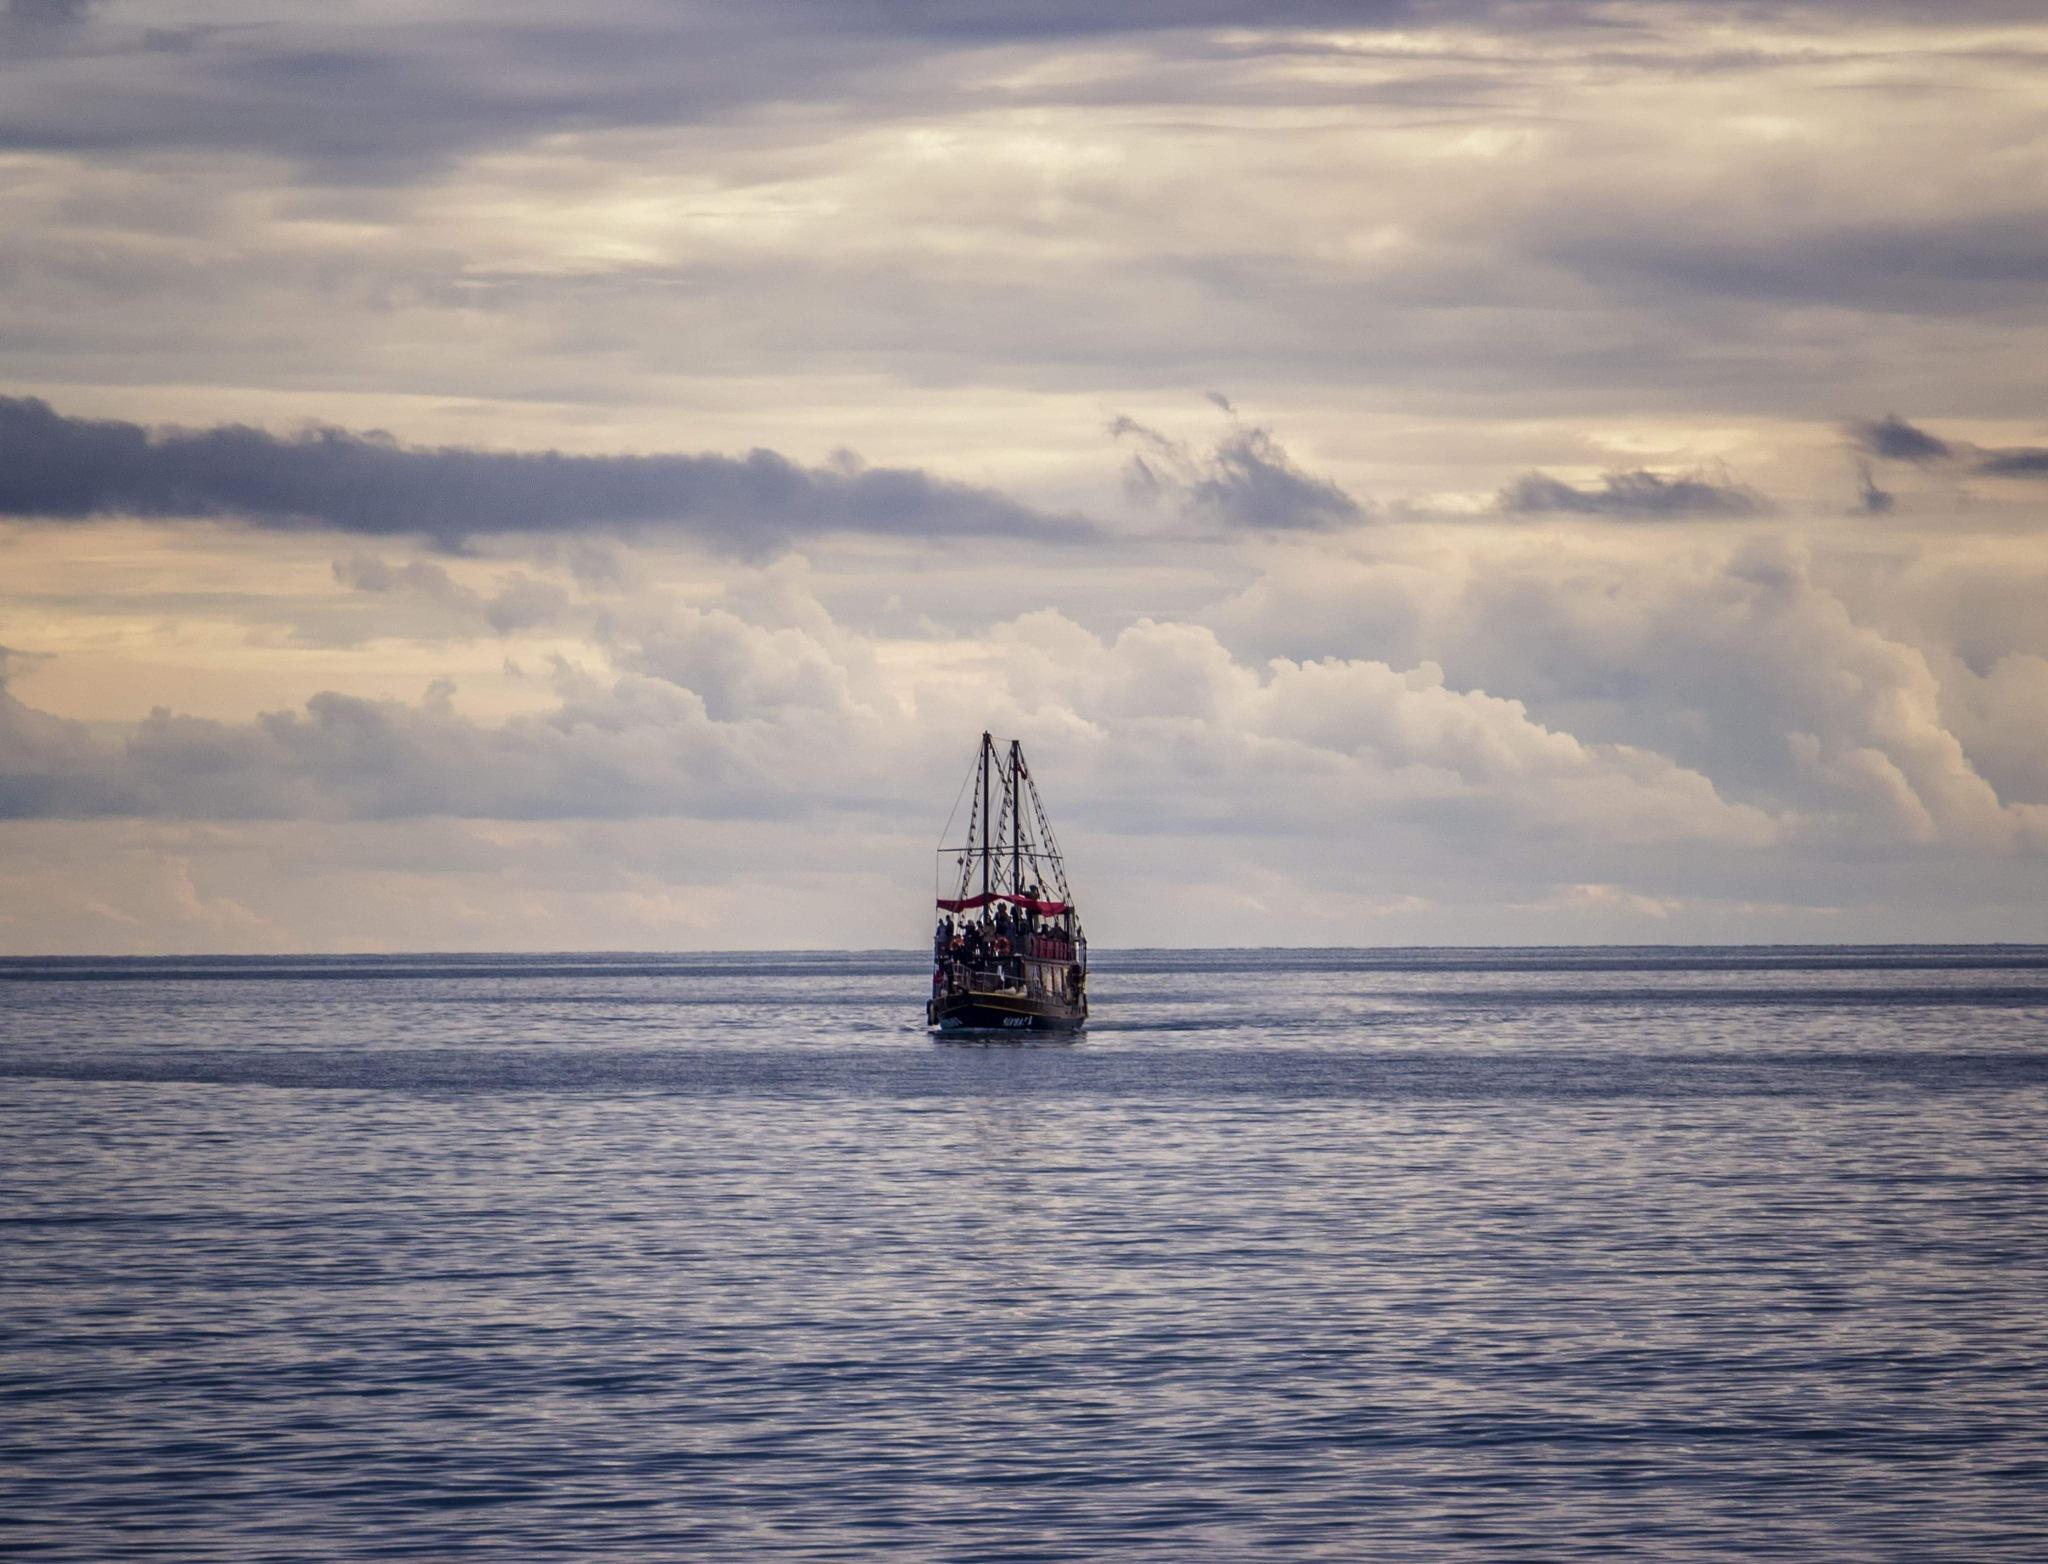 Lonely boat on the Mediterranean Sea  by Doris Bornheim